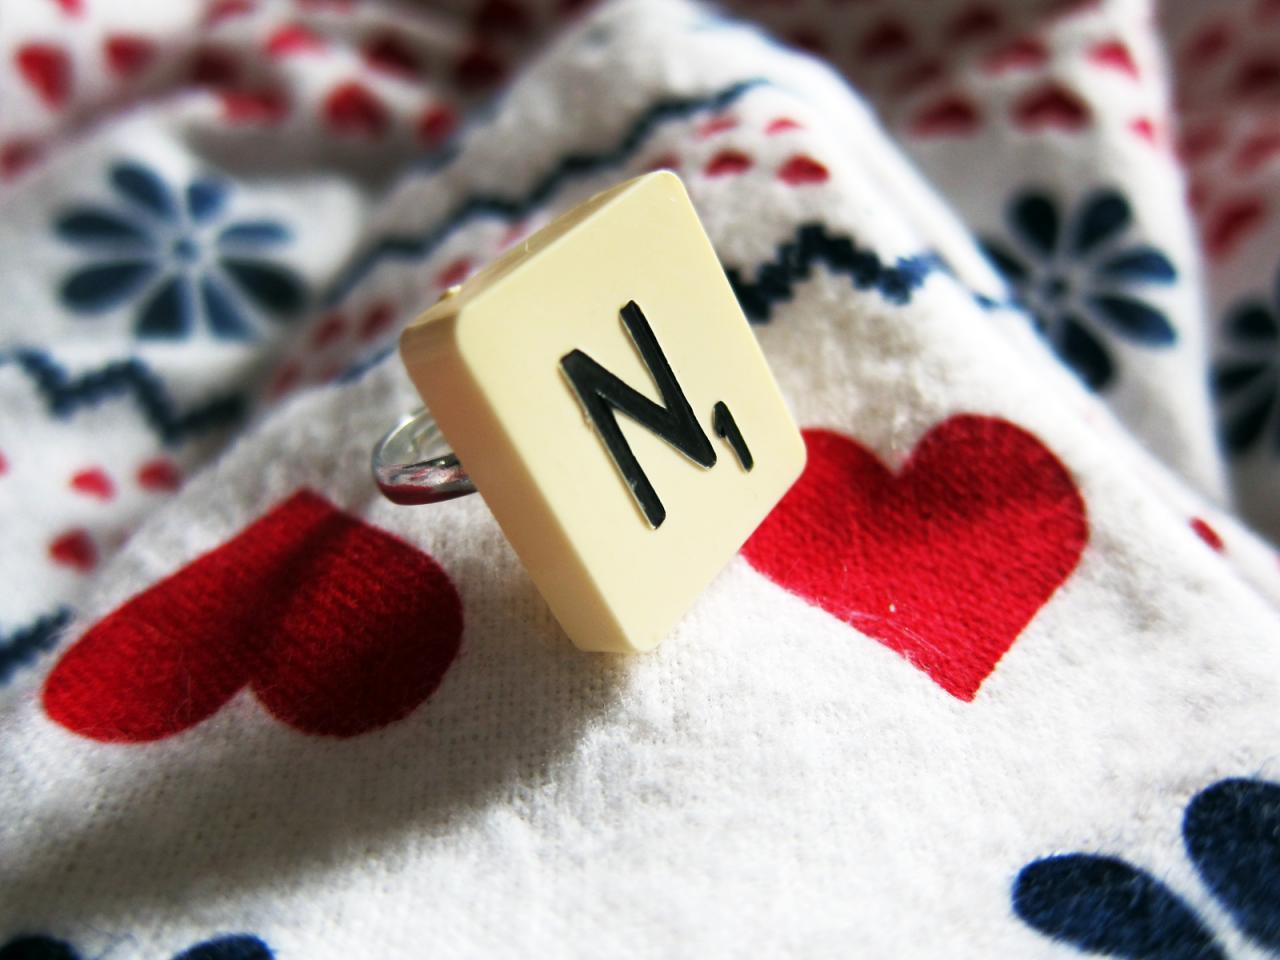 صور صور حرف a و n , اجمل الصور المميزه المكتوب عليها حرف n وa